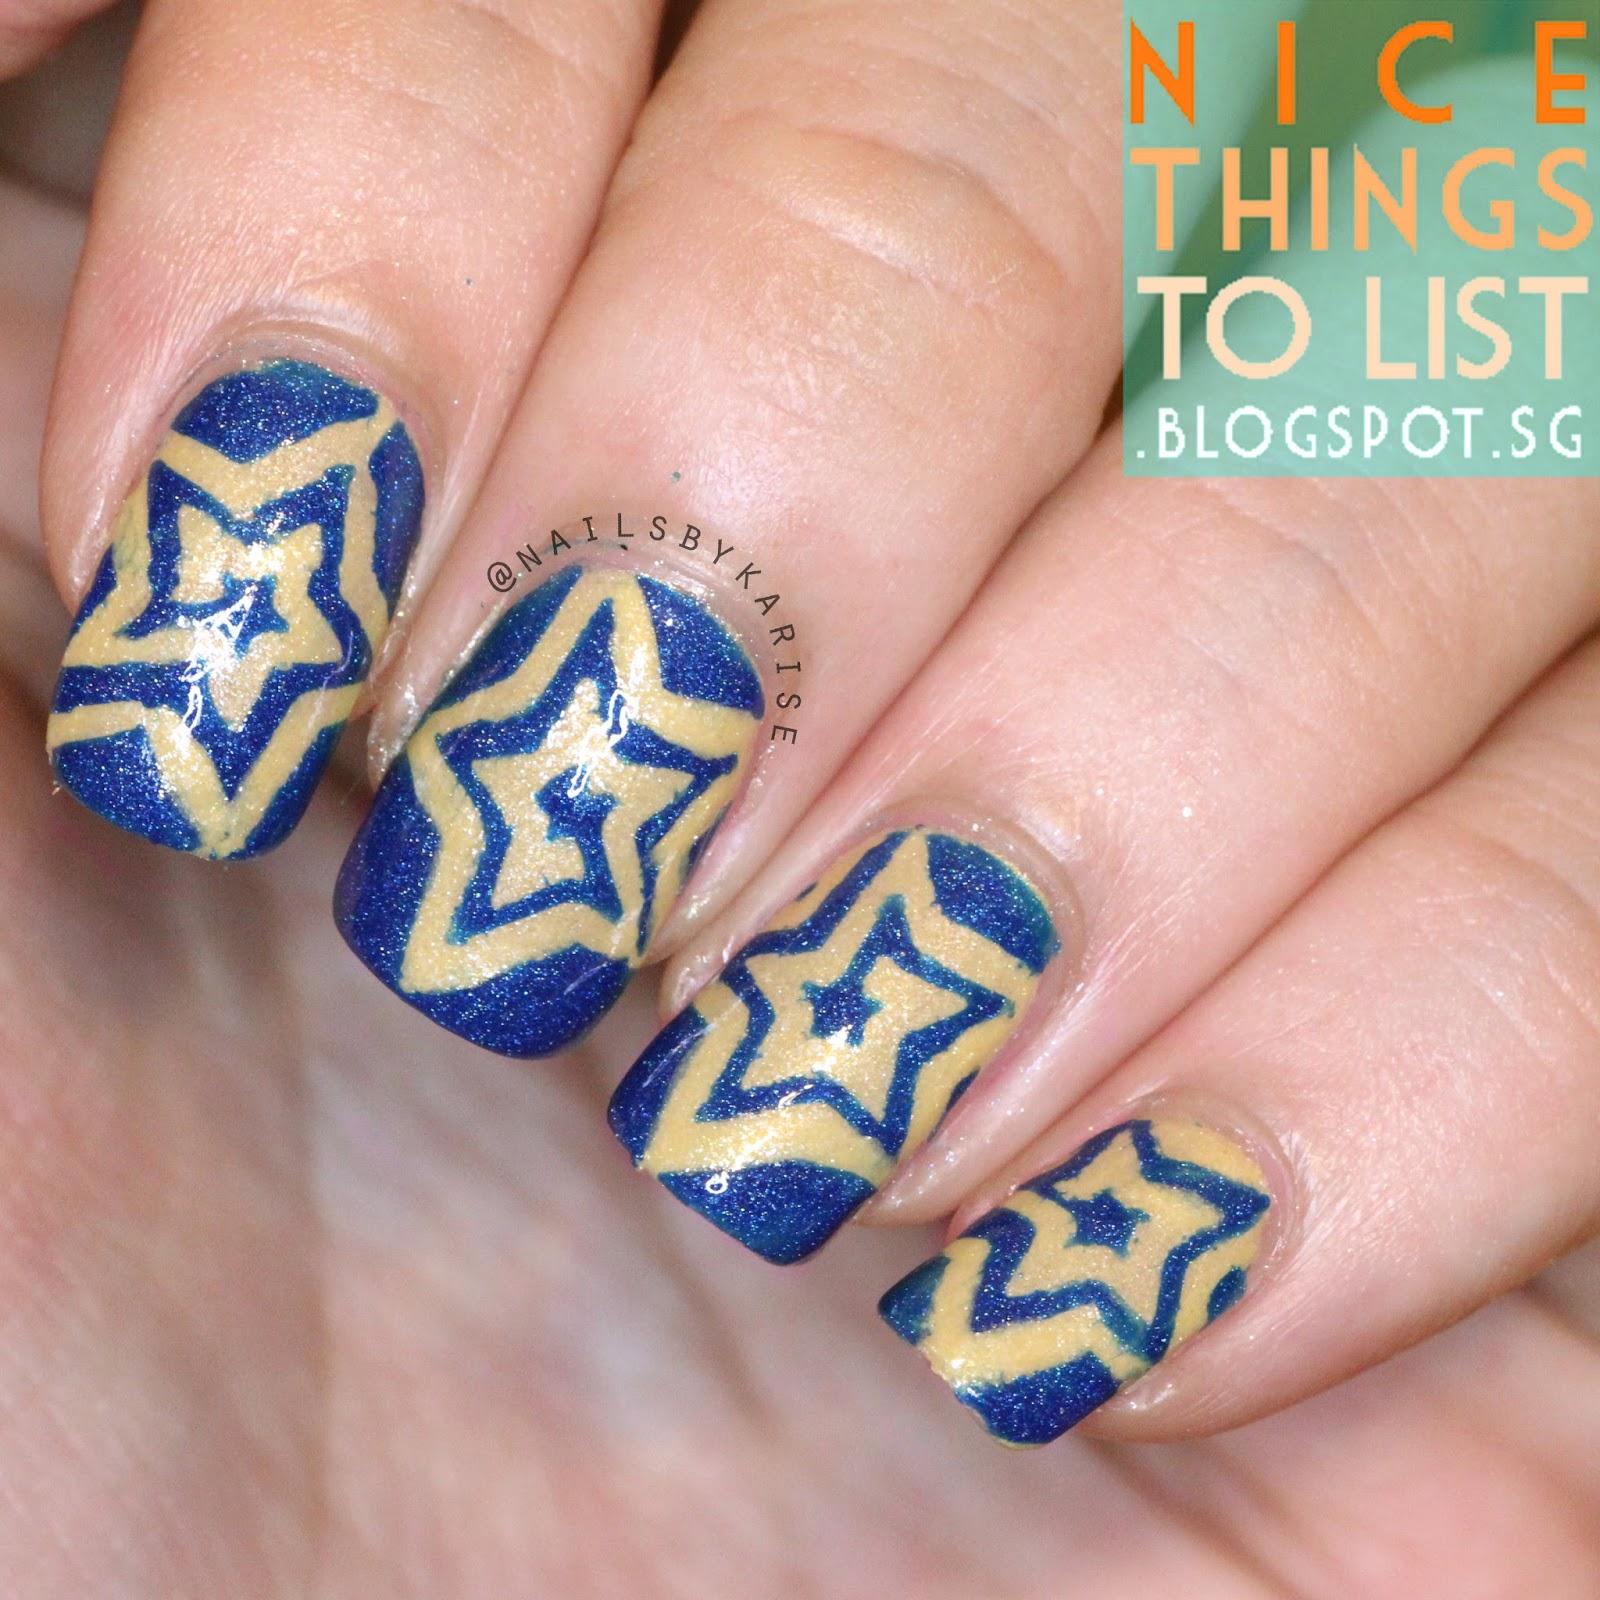 Starlight Nail Vinyls from BornPrettyStore Nail Art - Nice Things To ...